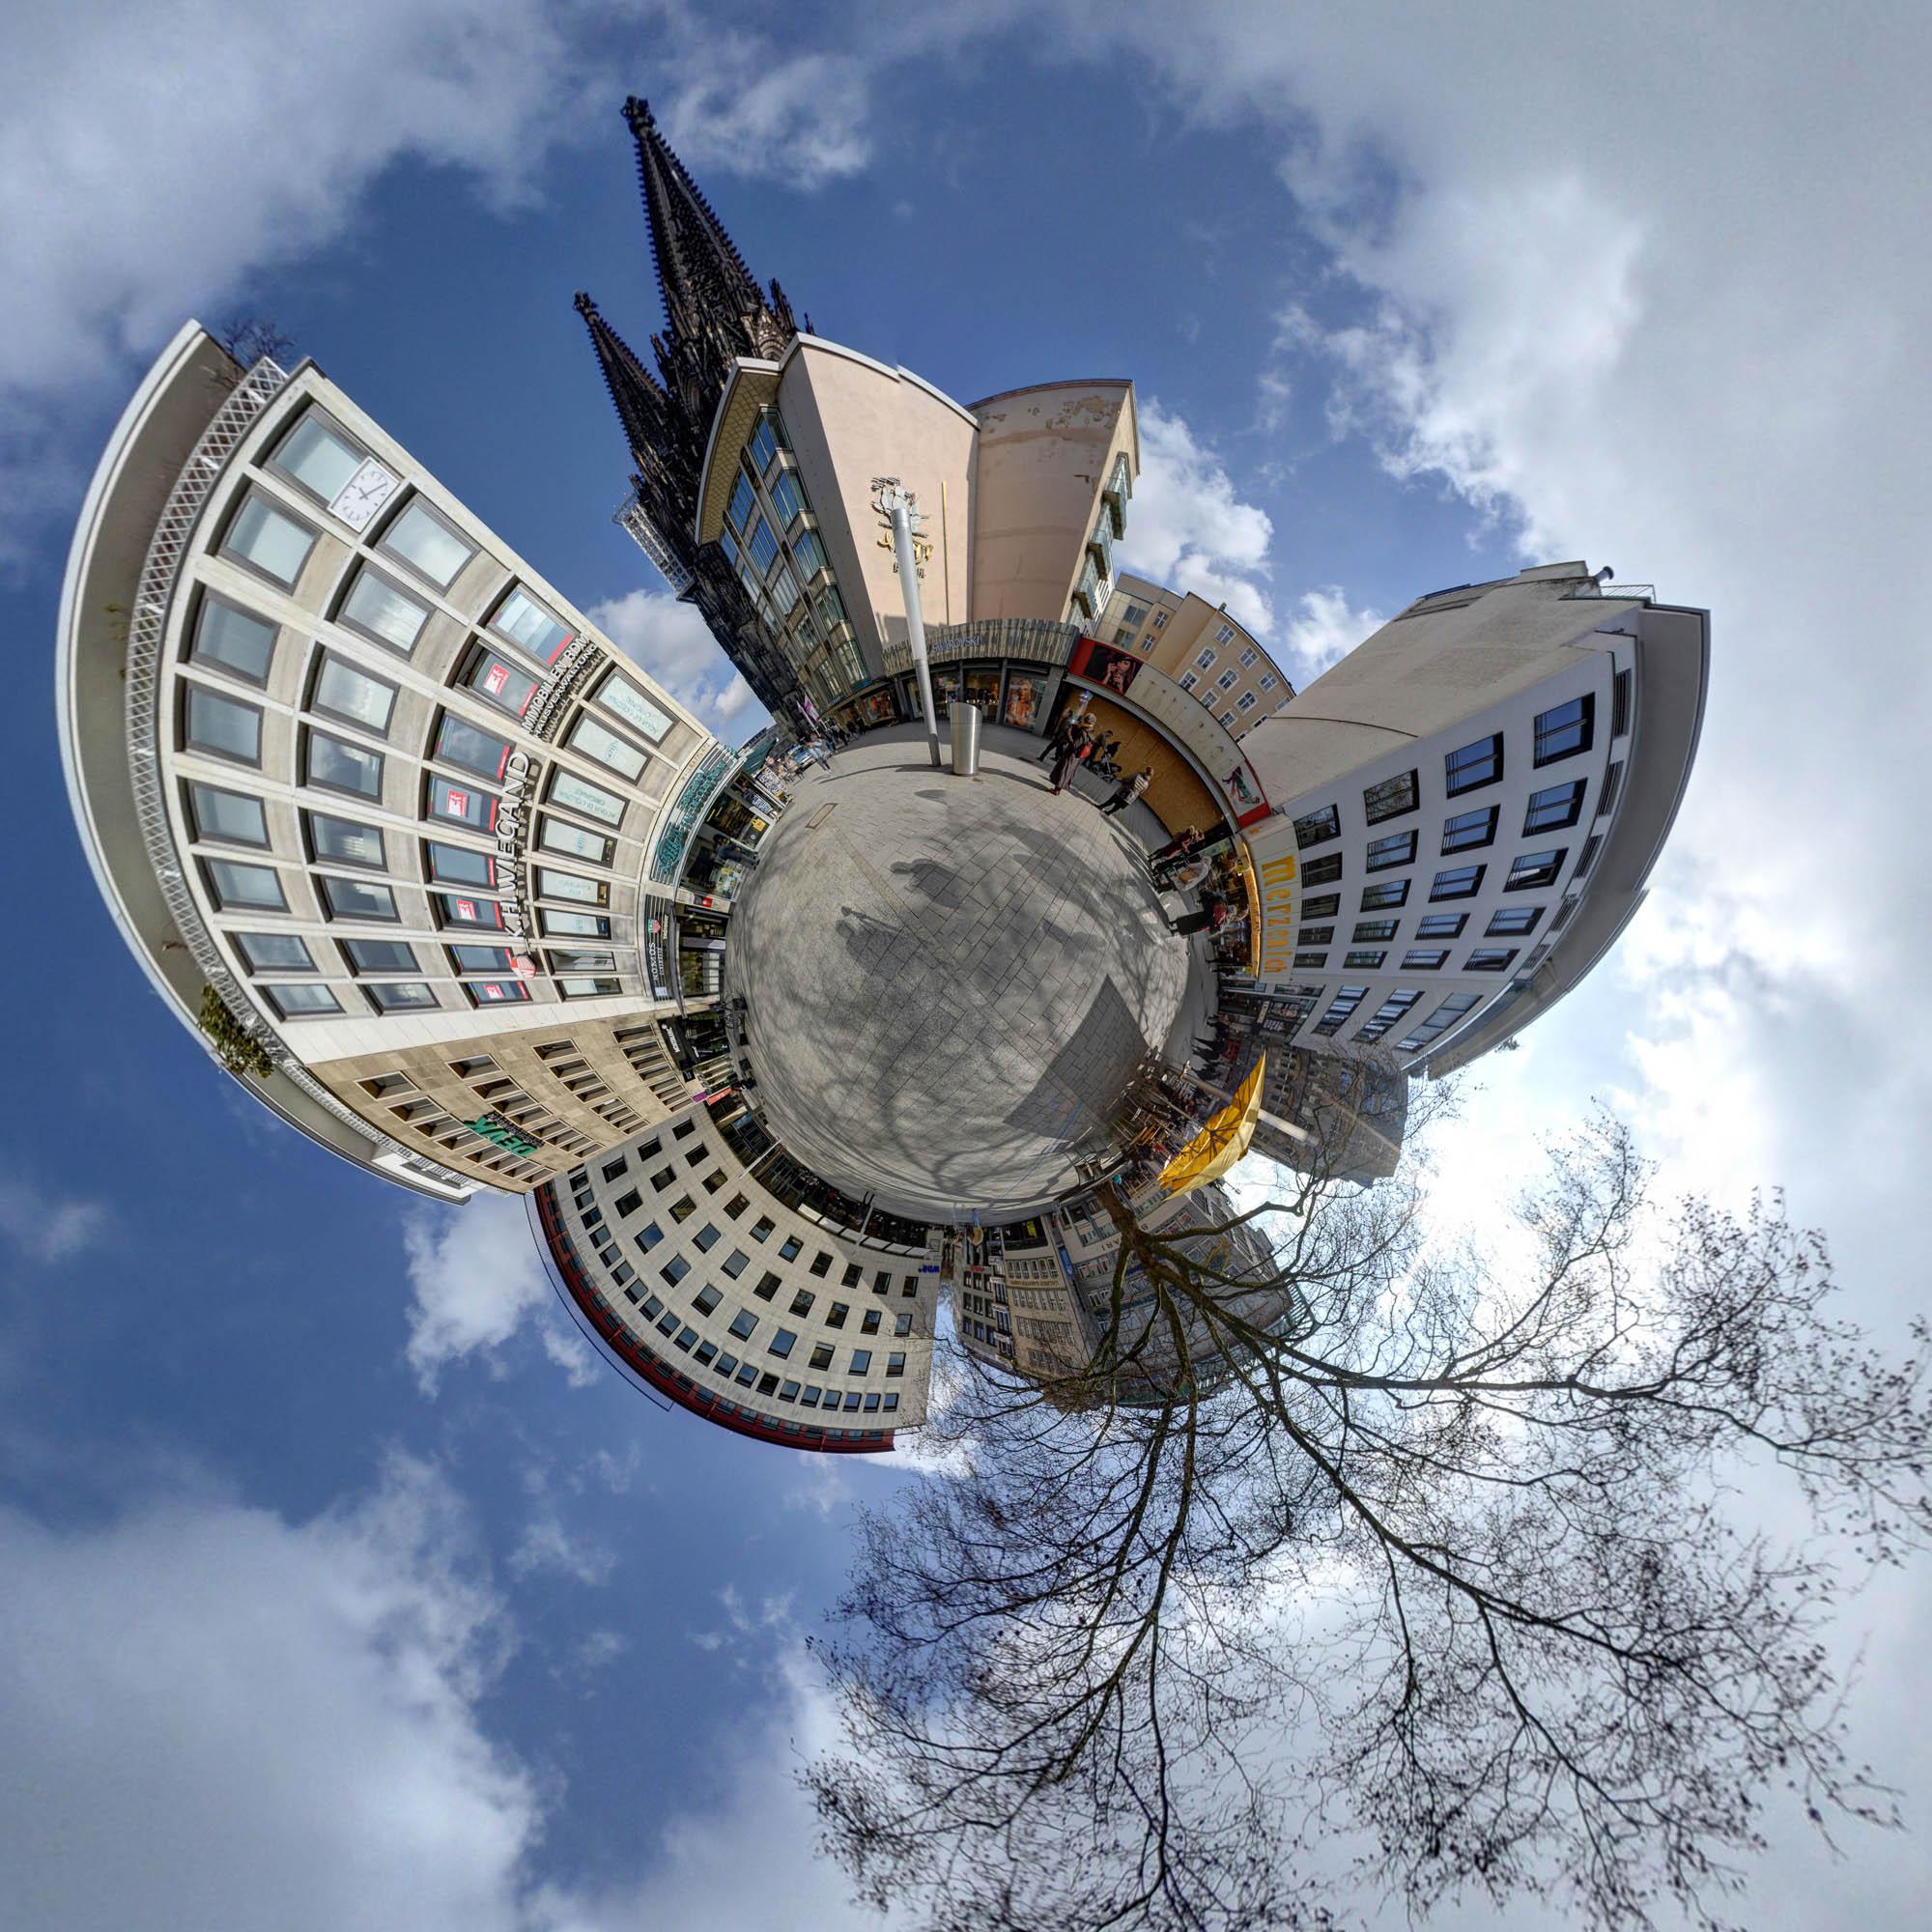 Architekturfotografie einmal anders